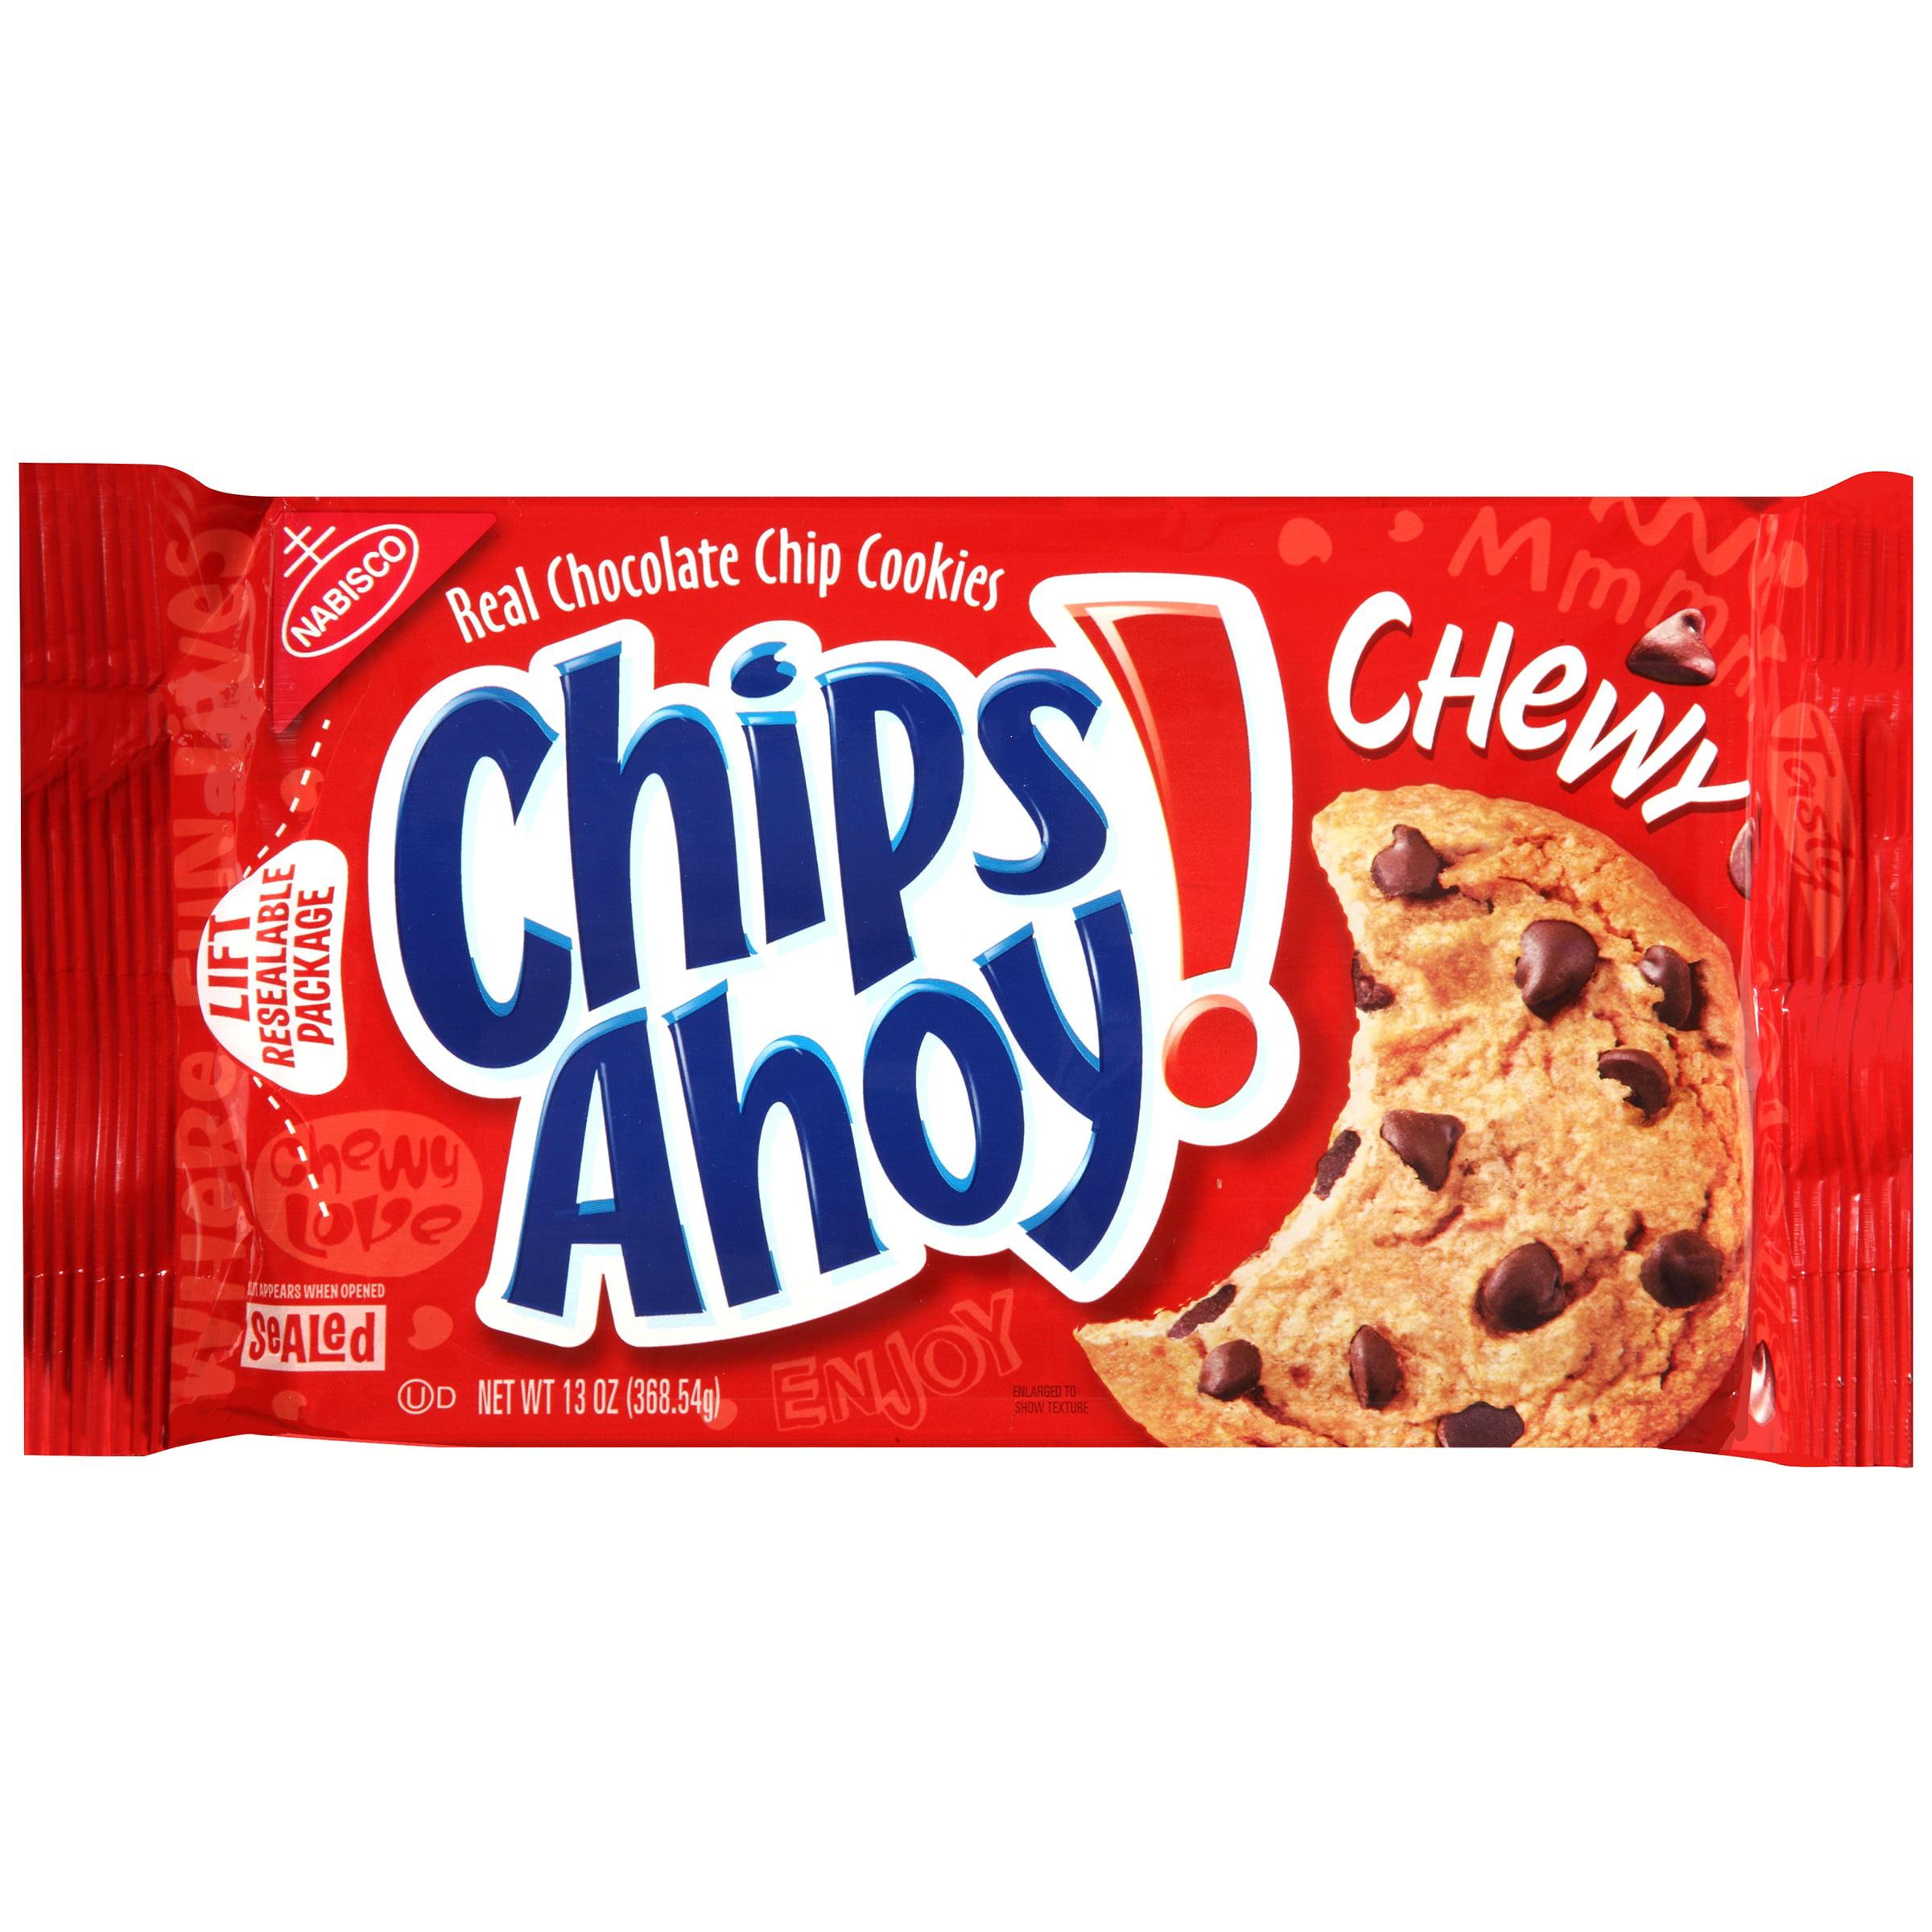 Cookies - Walmart.com - Walmart.com on nabisco wafer peanut butter cookies, nestle peanut cookies, peanut shaped cookies, planters peanuts from the 90 s, planters snacks, nutter butter peanut cookies, reese's peanut cookies, keebler peanut cookies,